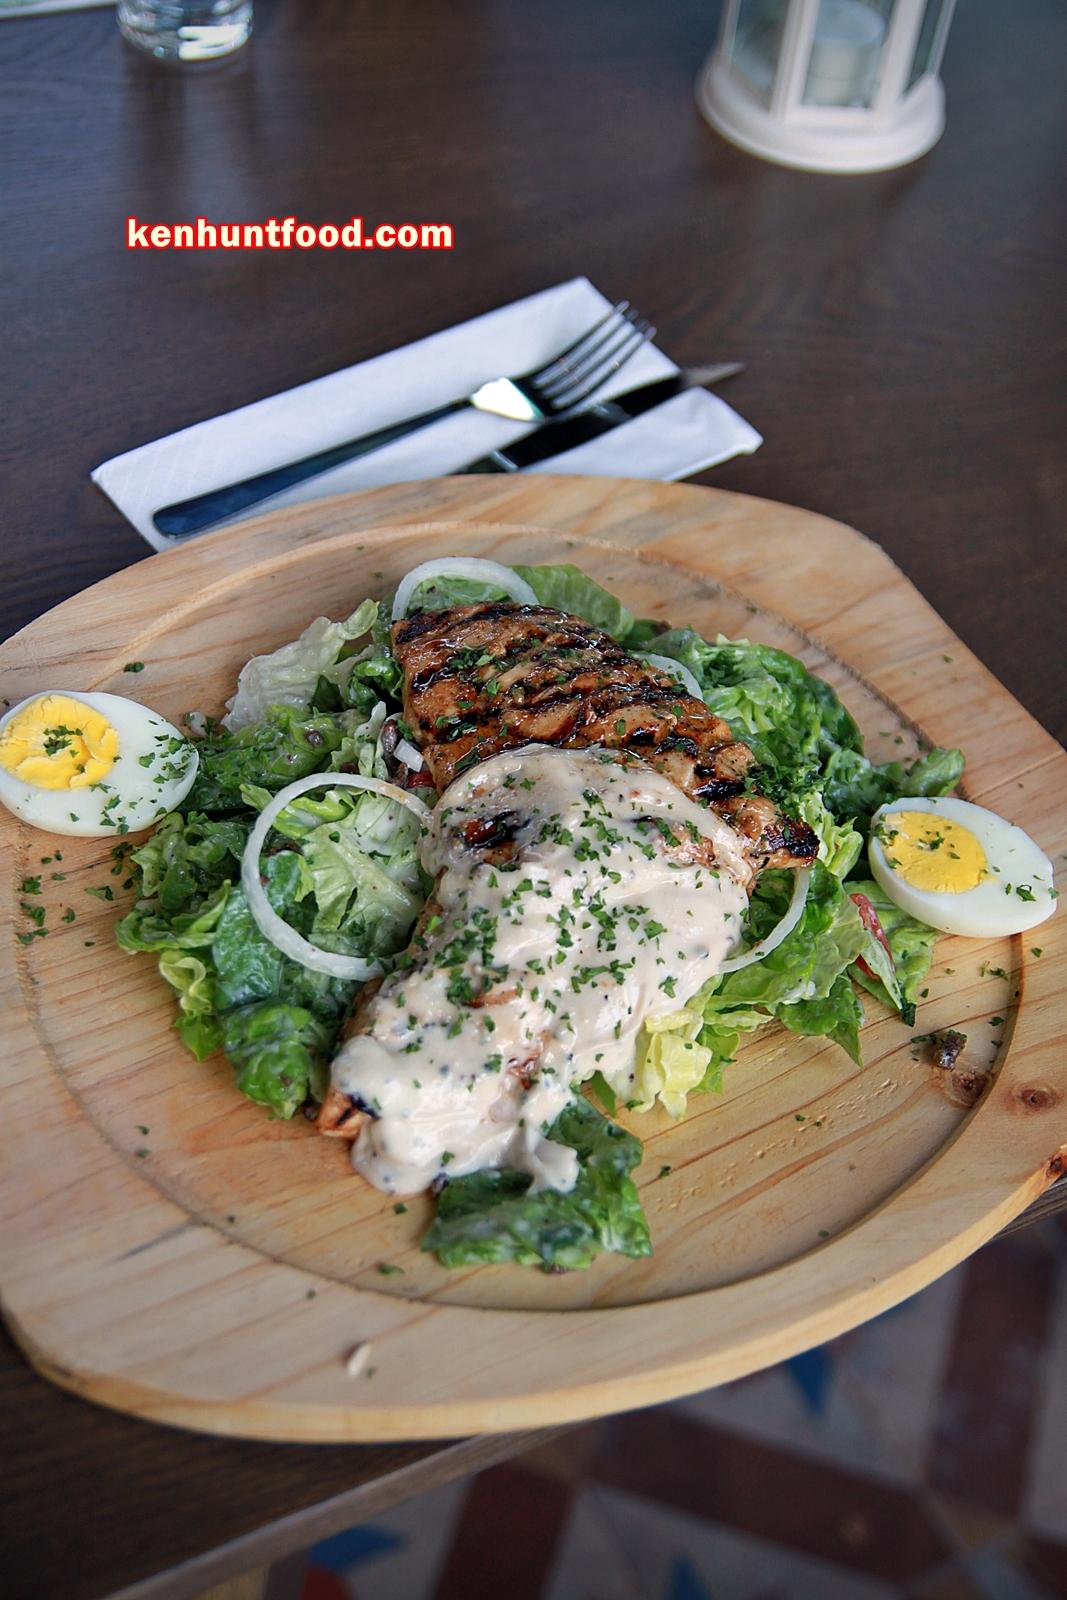 Ken hunts food rain garden bar cafe and restaurant for Food bar garden